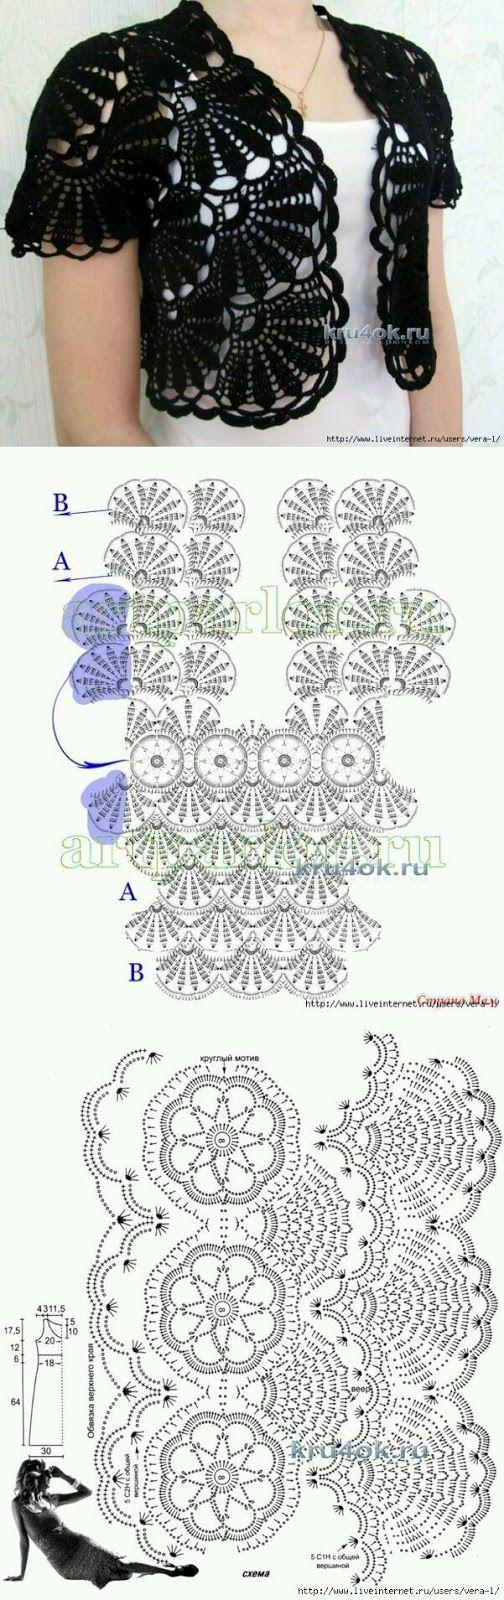 59 best Patrones images on Pinterest   Crochet patterns, Crochet ...